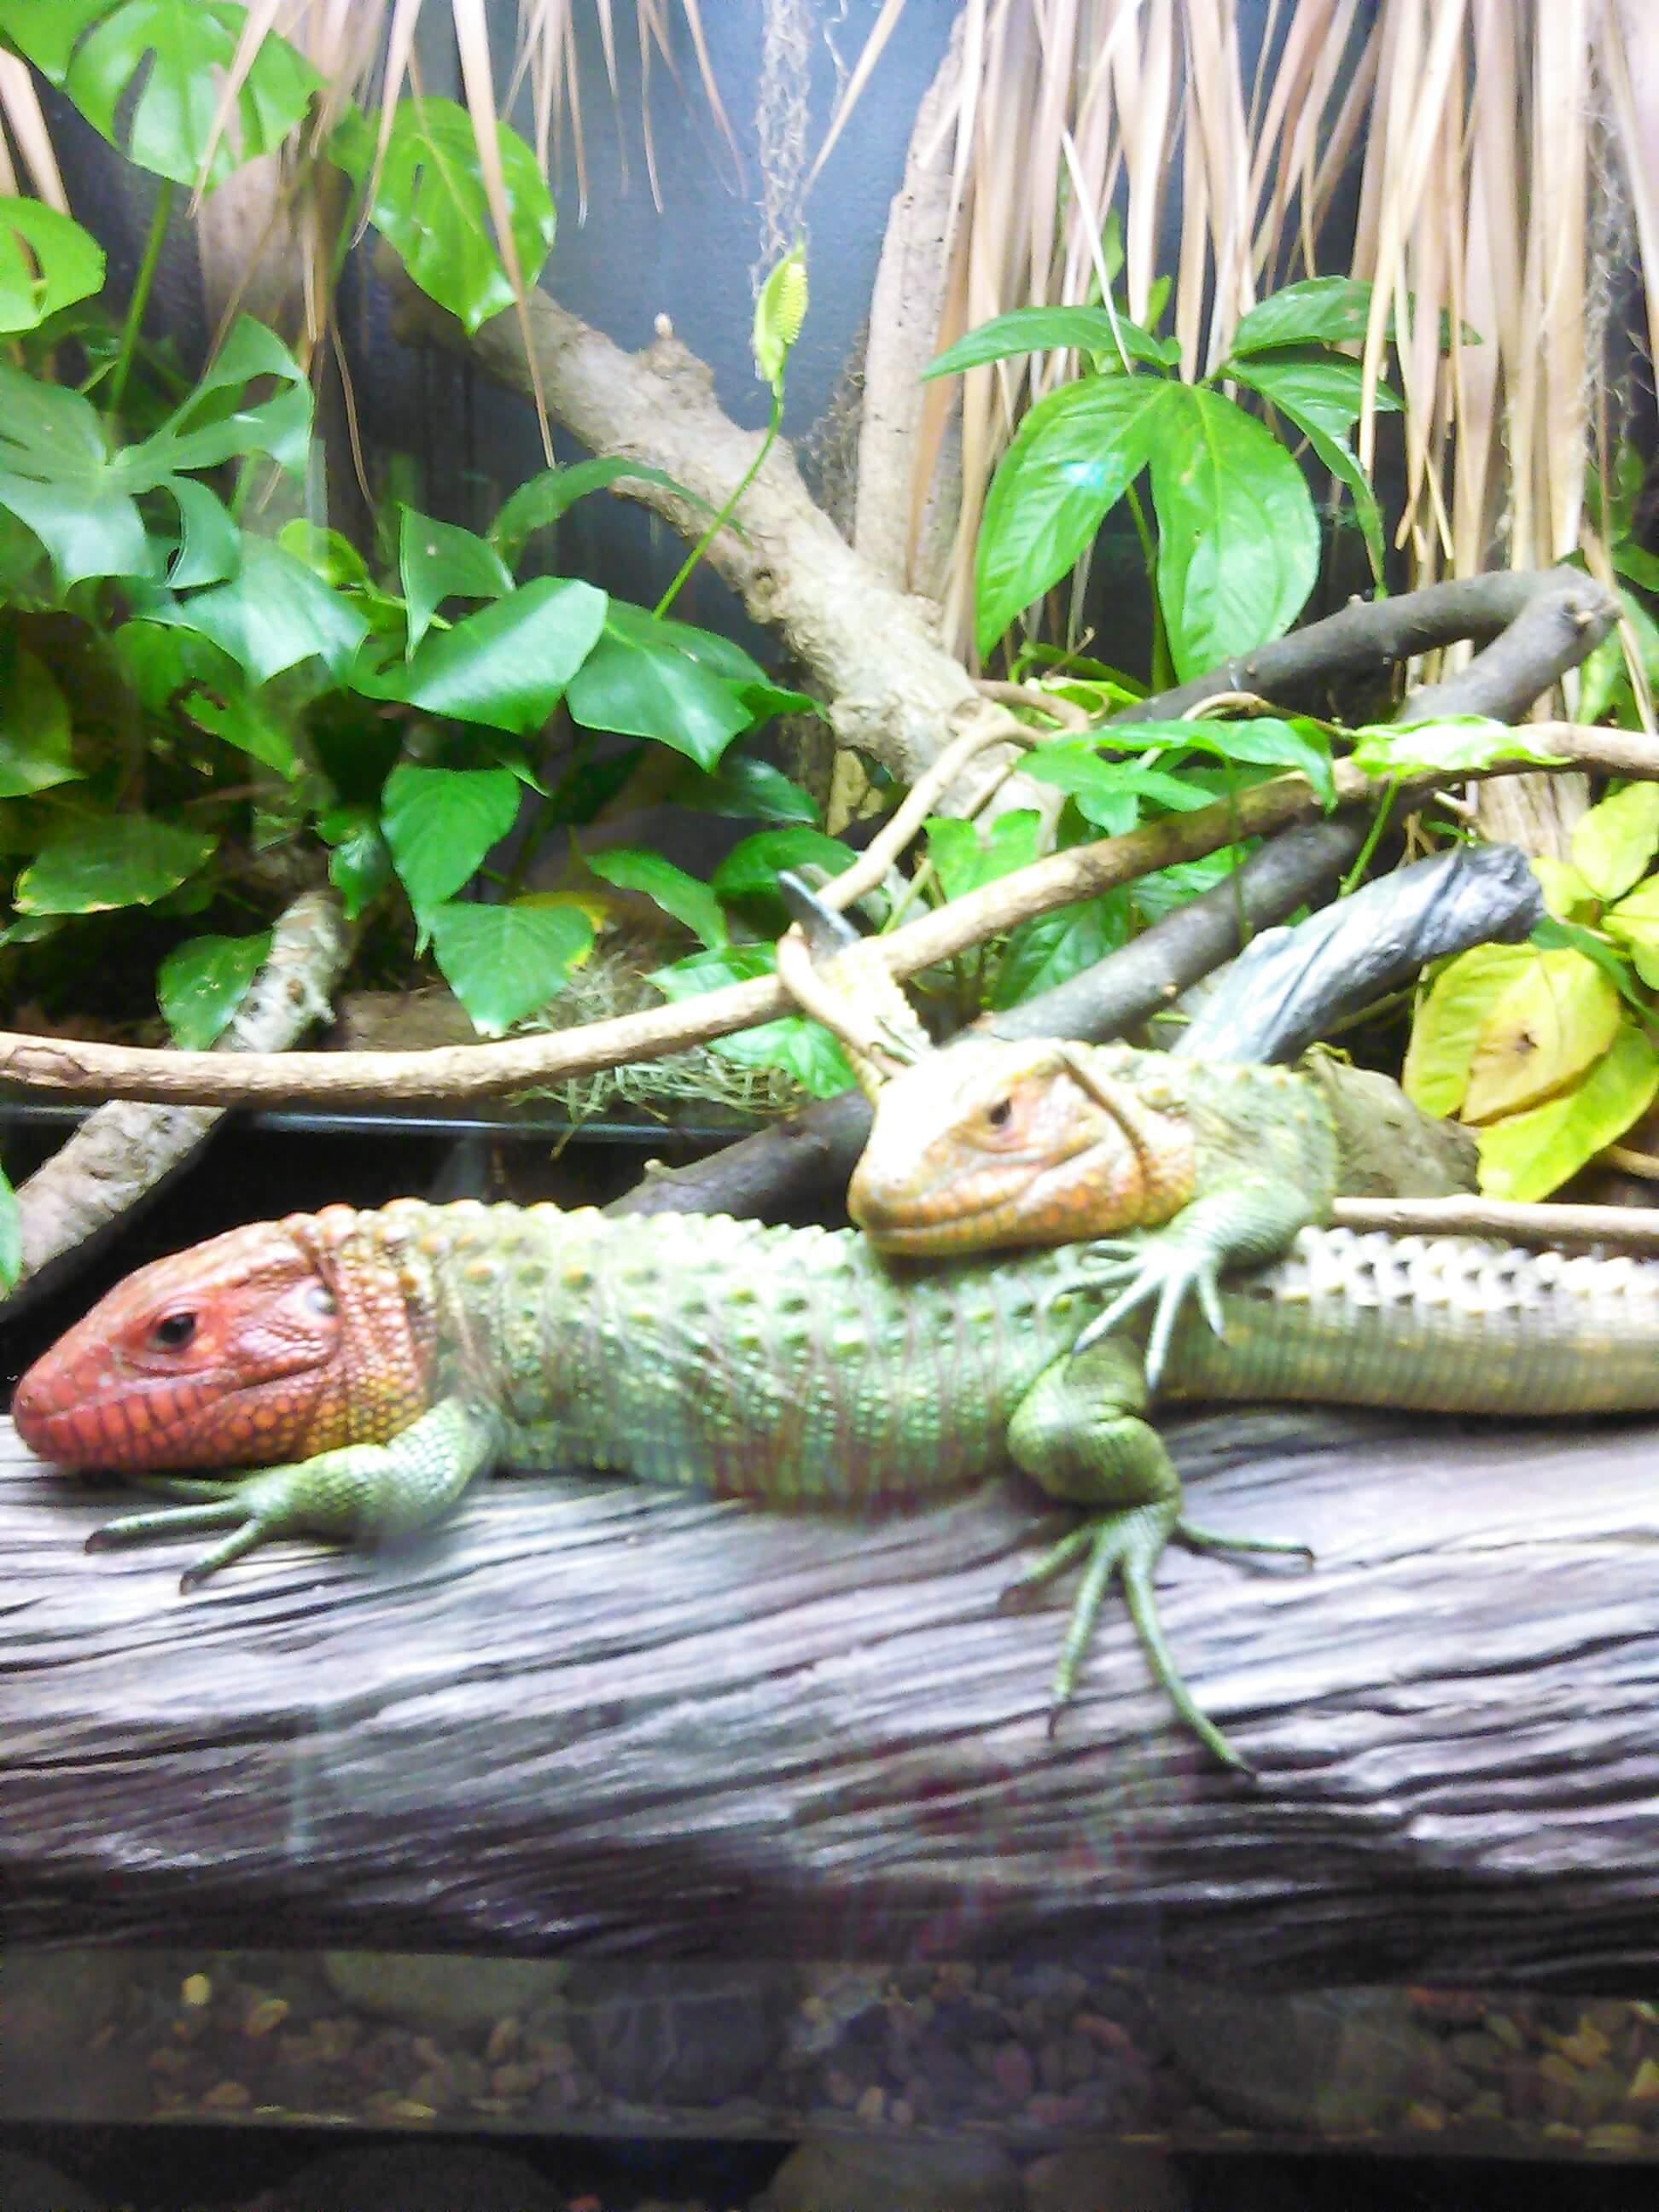 General Reptile Care -Reptile & Amphibians Care | SafariVet Lg. City, TX